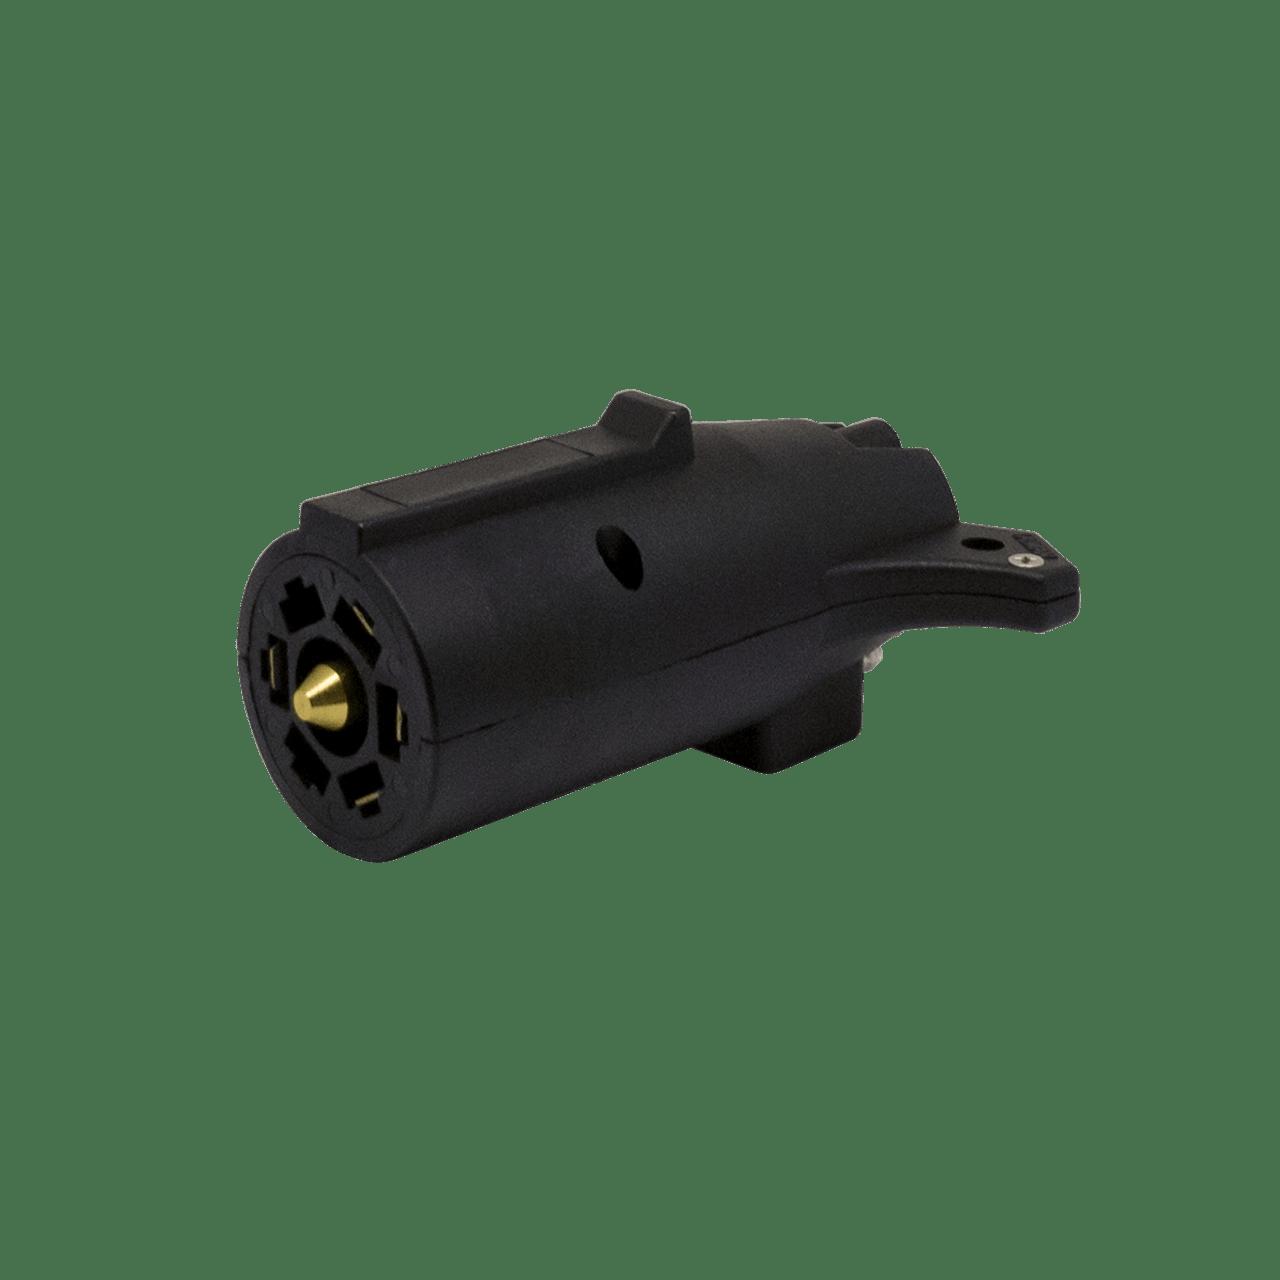 77P5F --- 7-Way Flat Pin to 5-Prong Flat Adapter